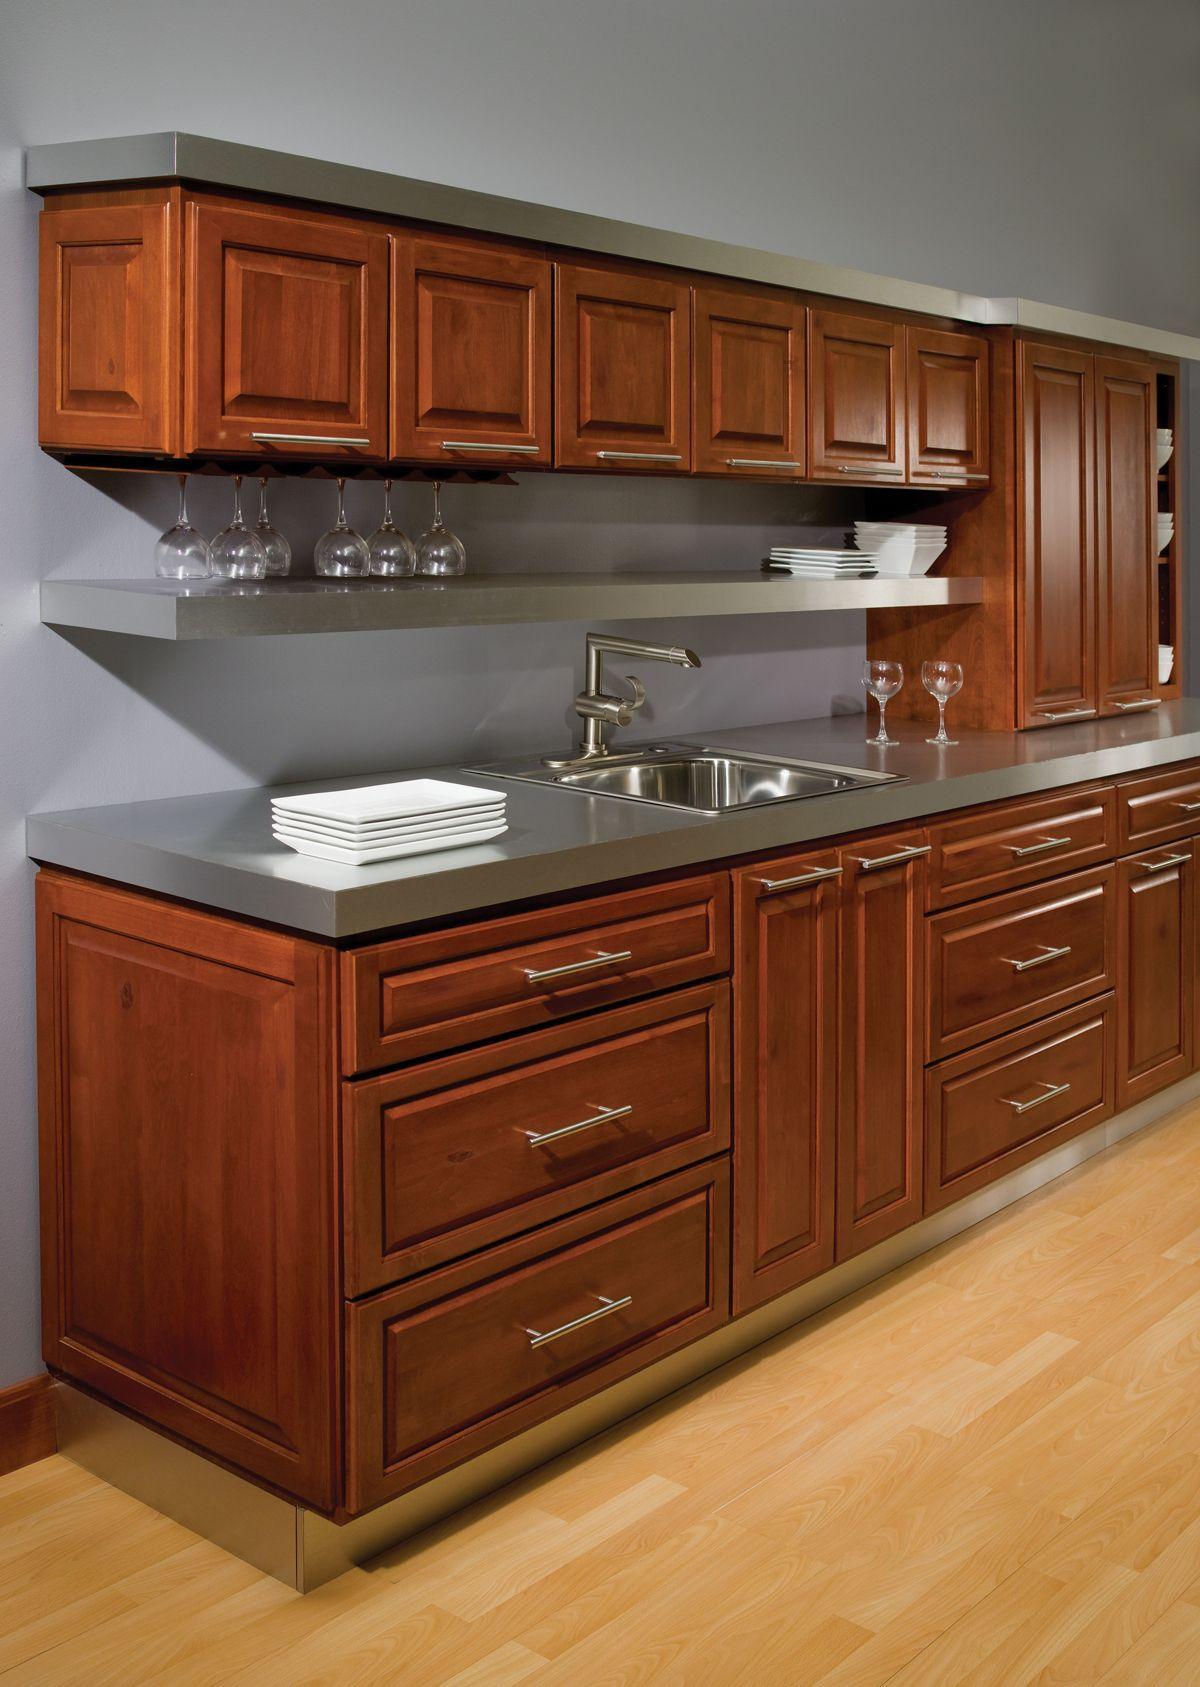 Stanford Square Alder Chestnut Stock Kitchen Cabinets Kitchen Cabinets Kitchen Design